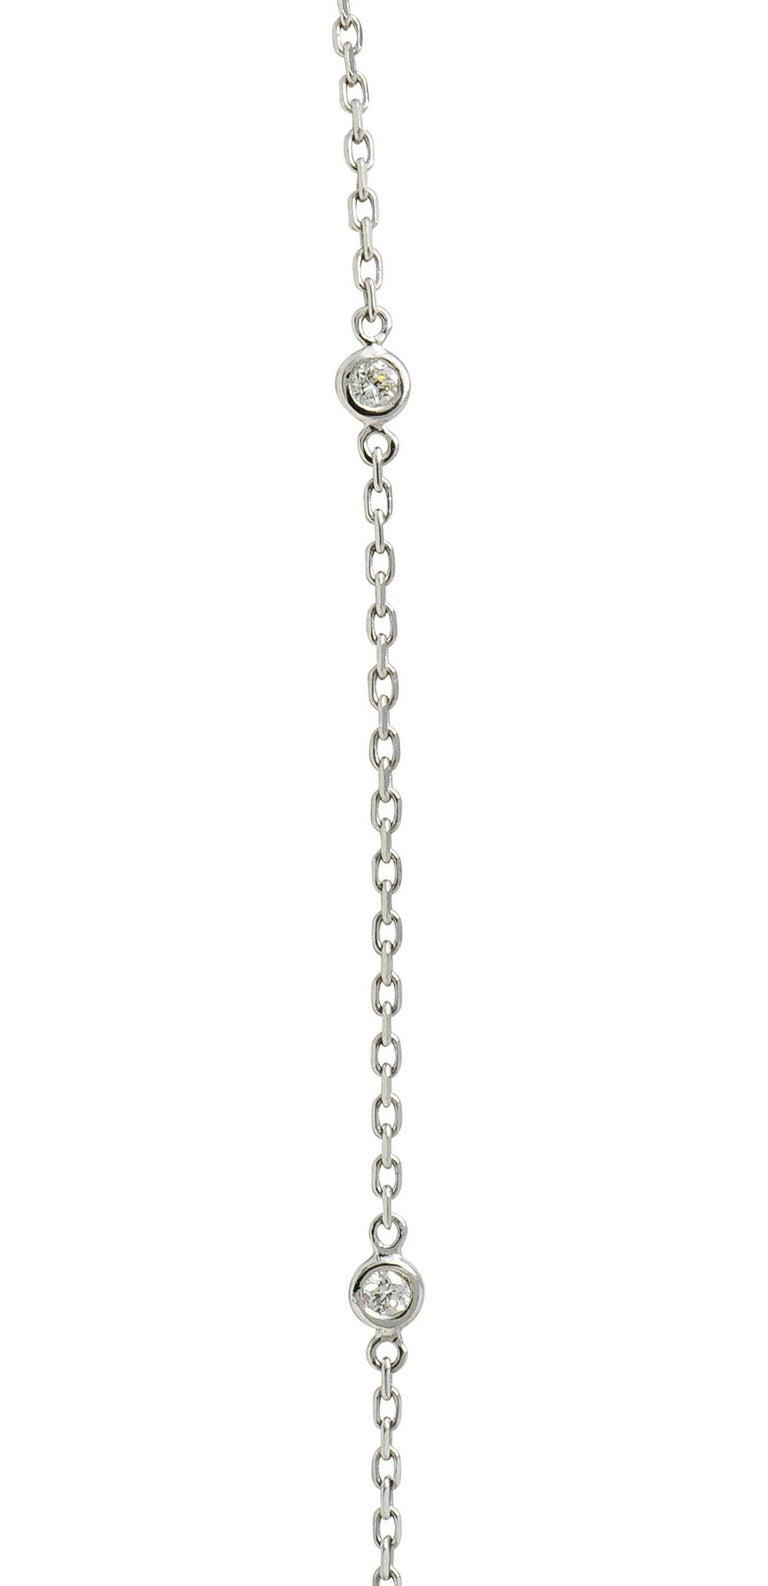 Pink Tourmaline Diamond 18 Karat White Gold Cluster Pendant Necklace For Sale 1